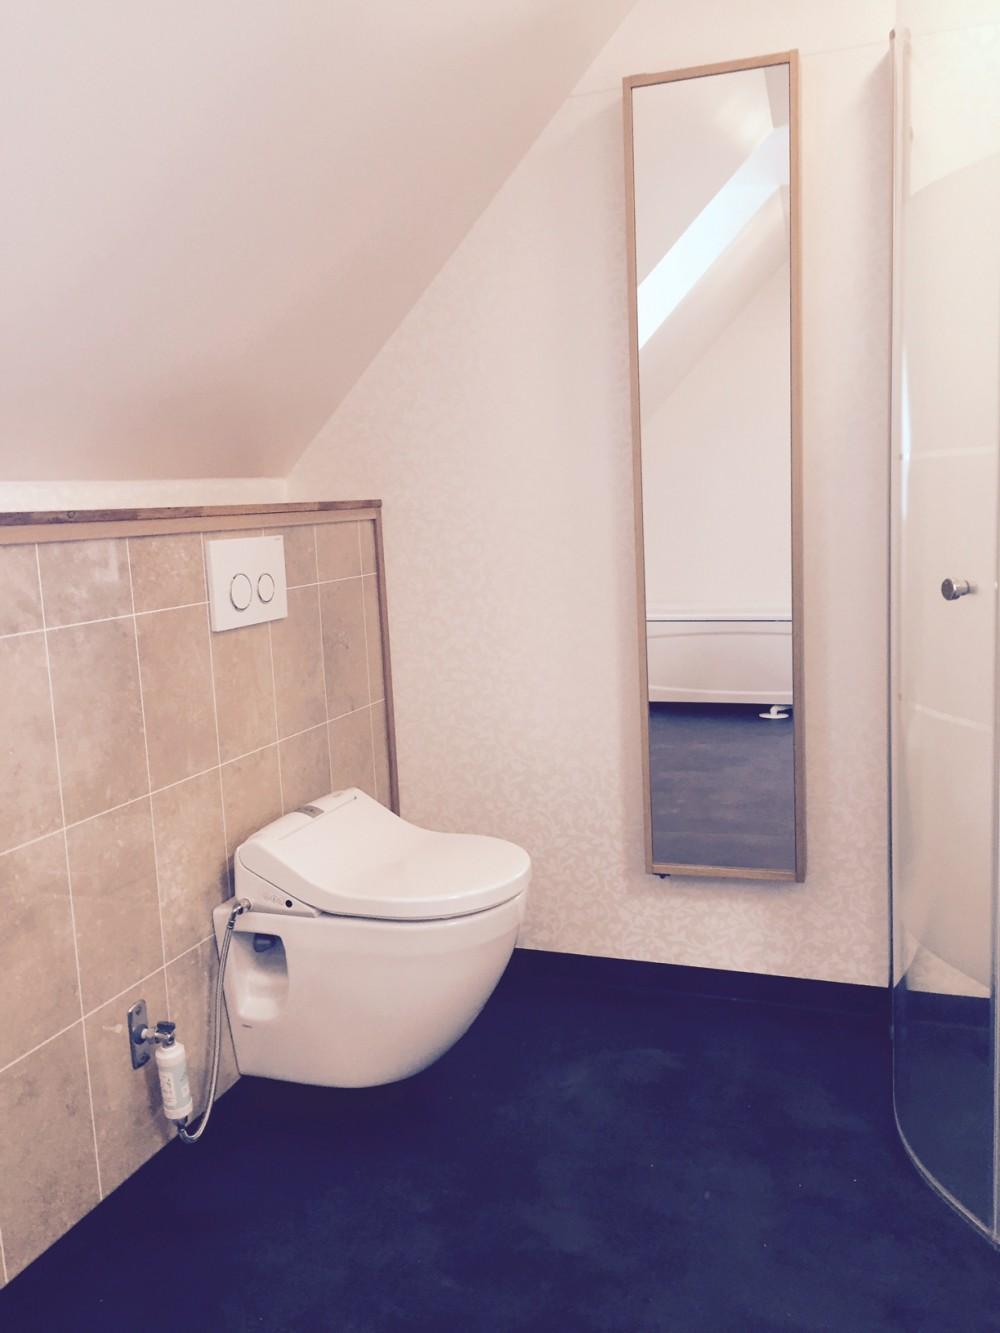 japanese toilet bidet combination.  TOTO NC CW762Y japan bidet toilet smart combination maro d italia di600 Maro D Italia DI600 Premium Italian Design seat Tooaleta